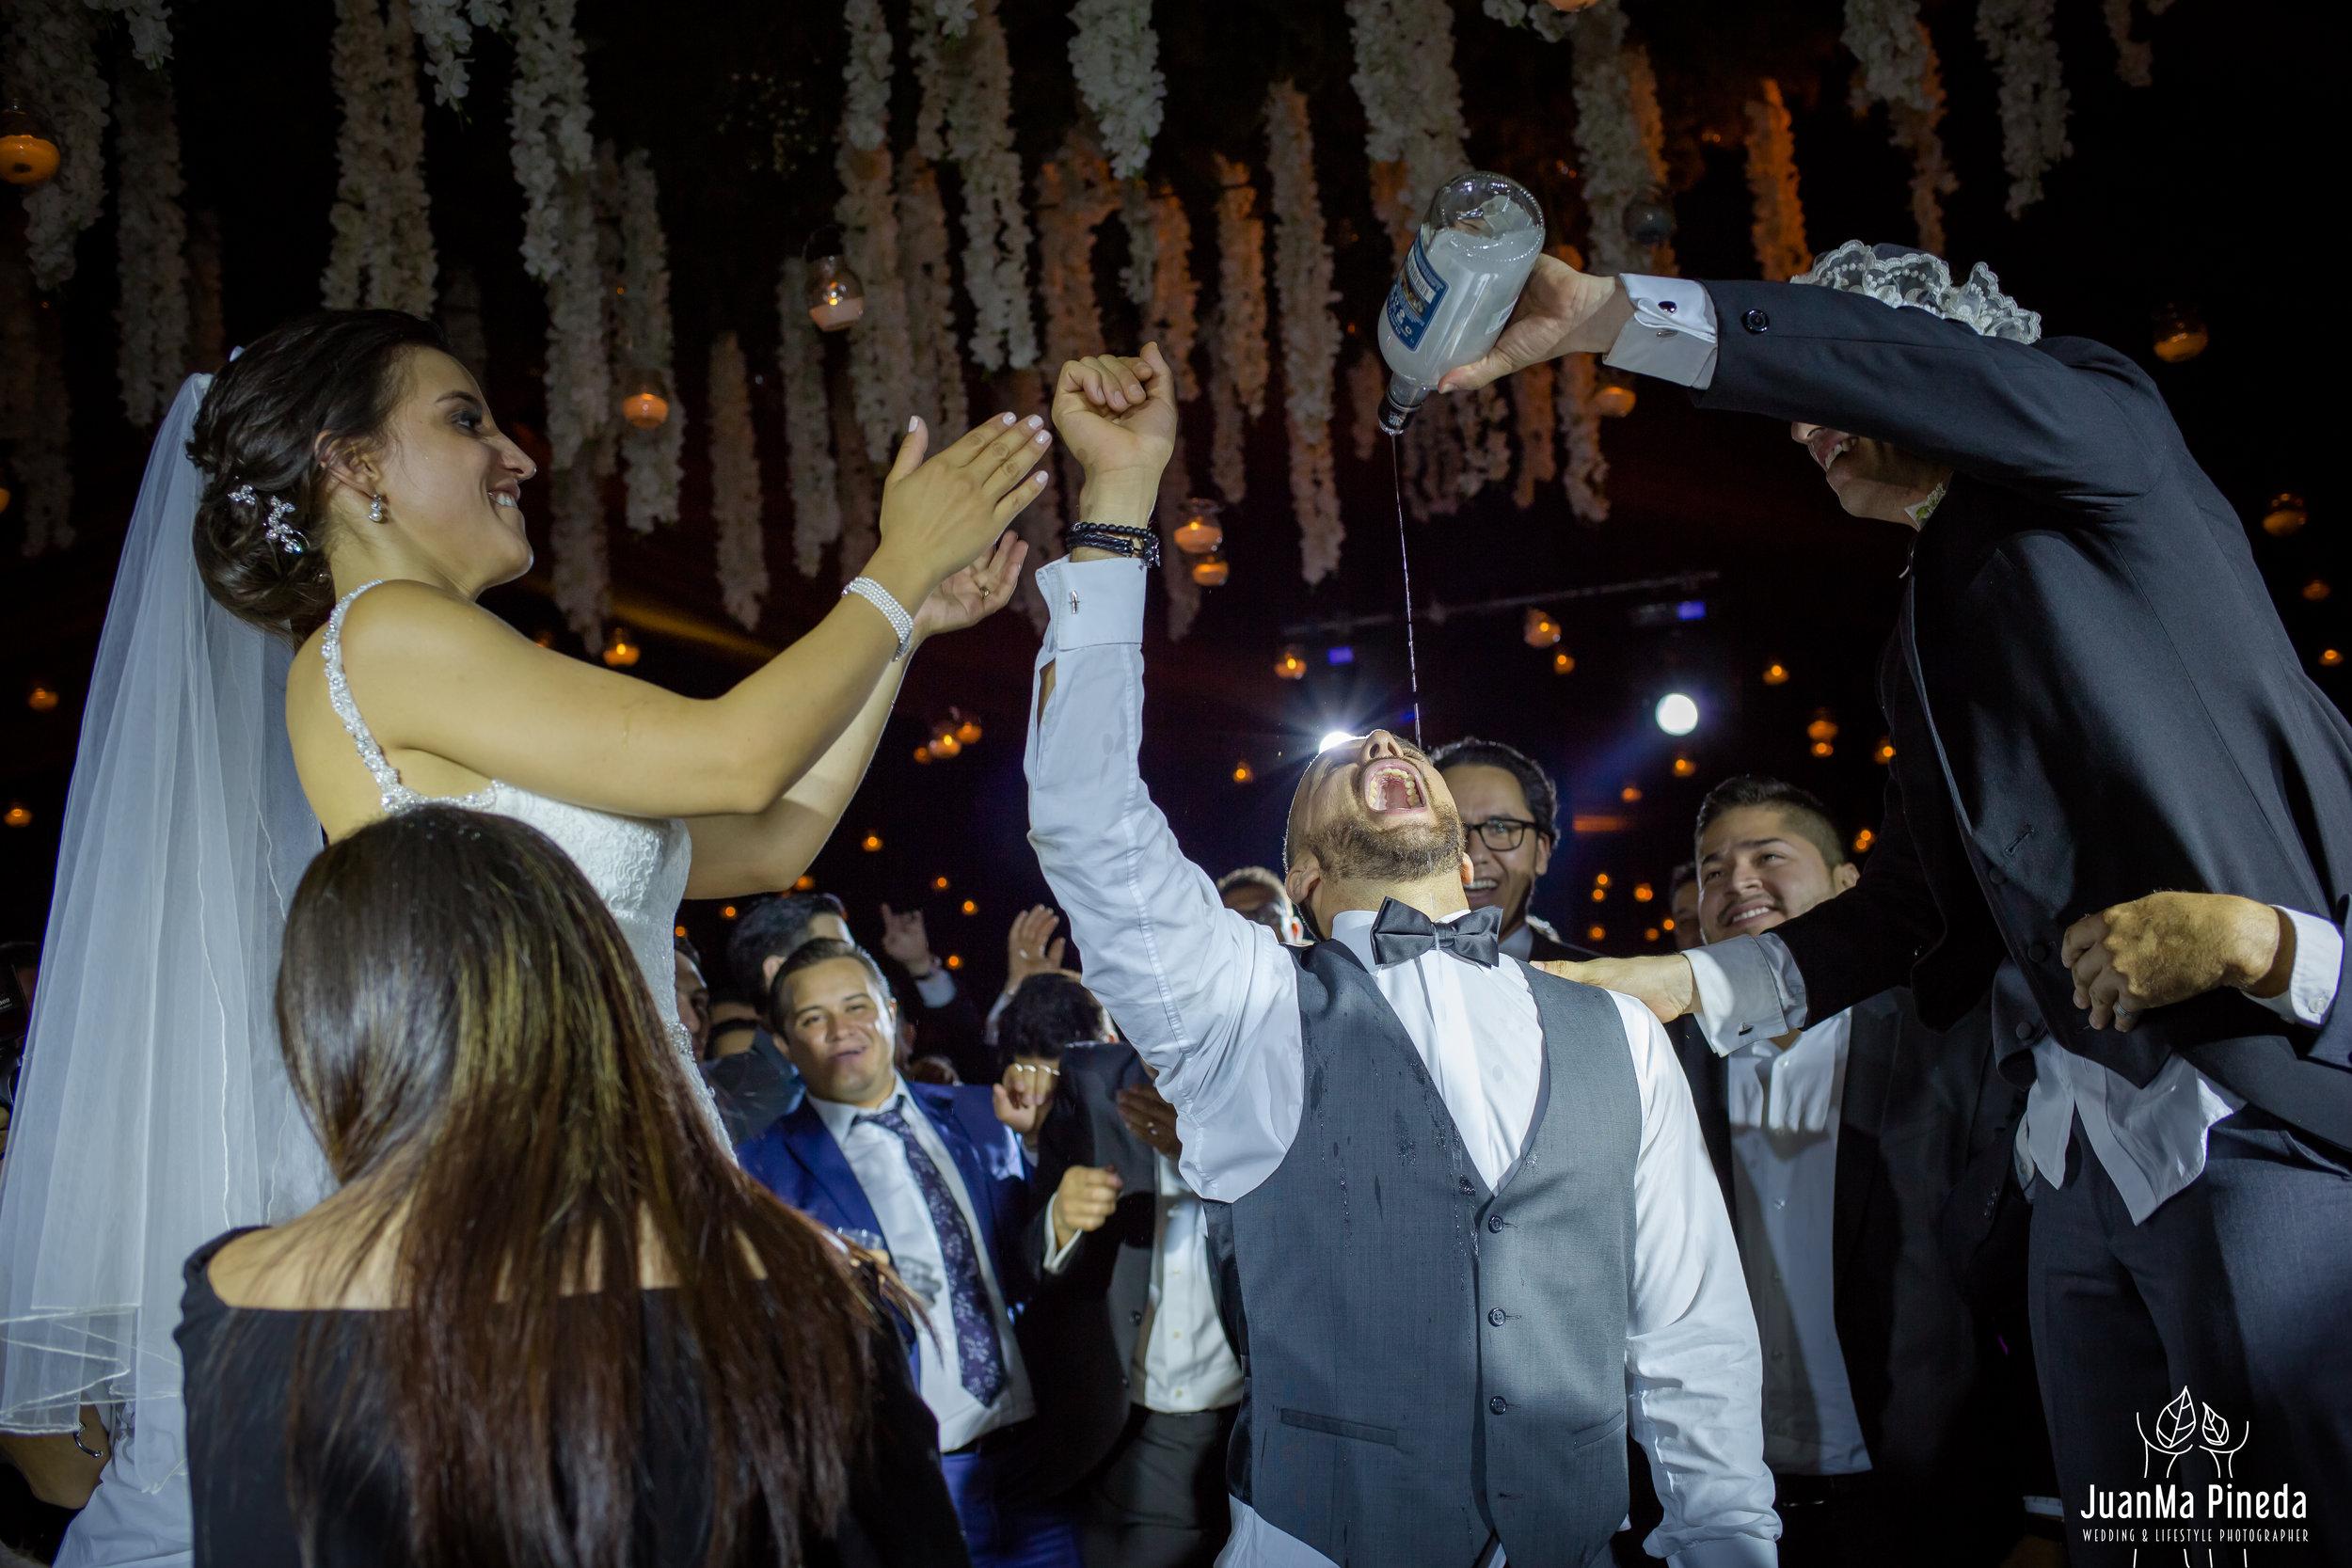 Wedding+Day+Photographer-1-16.jpg